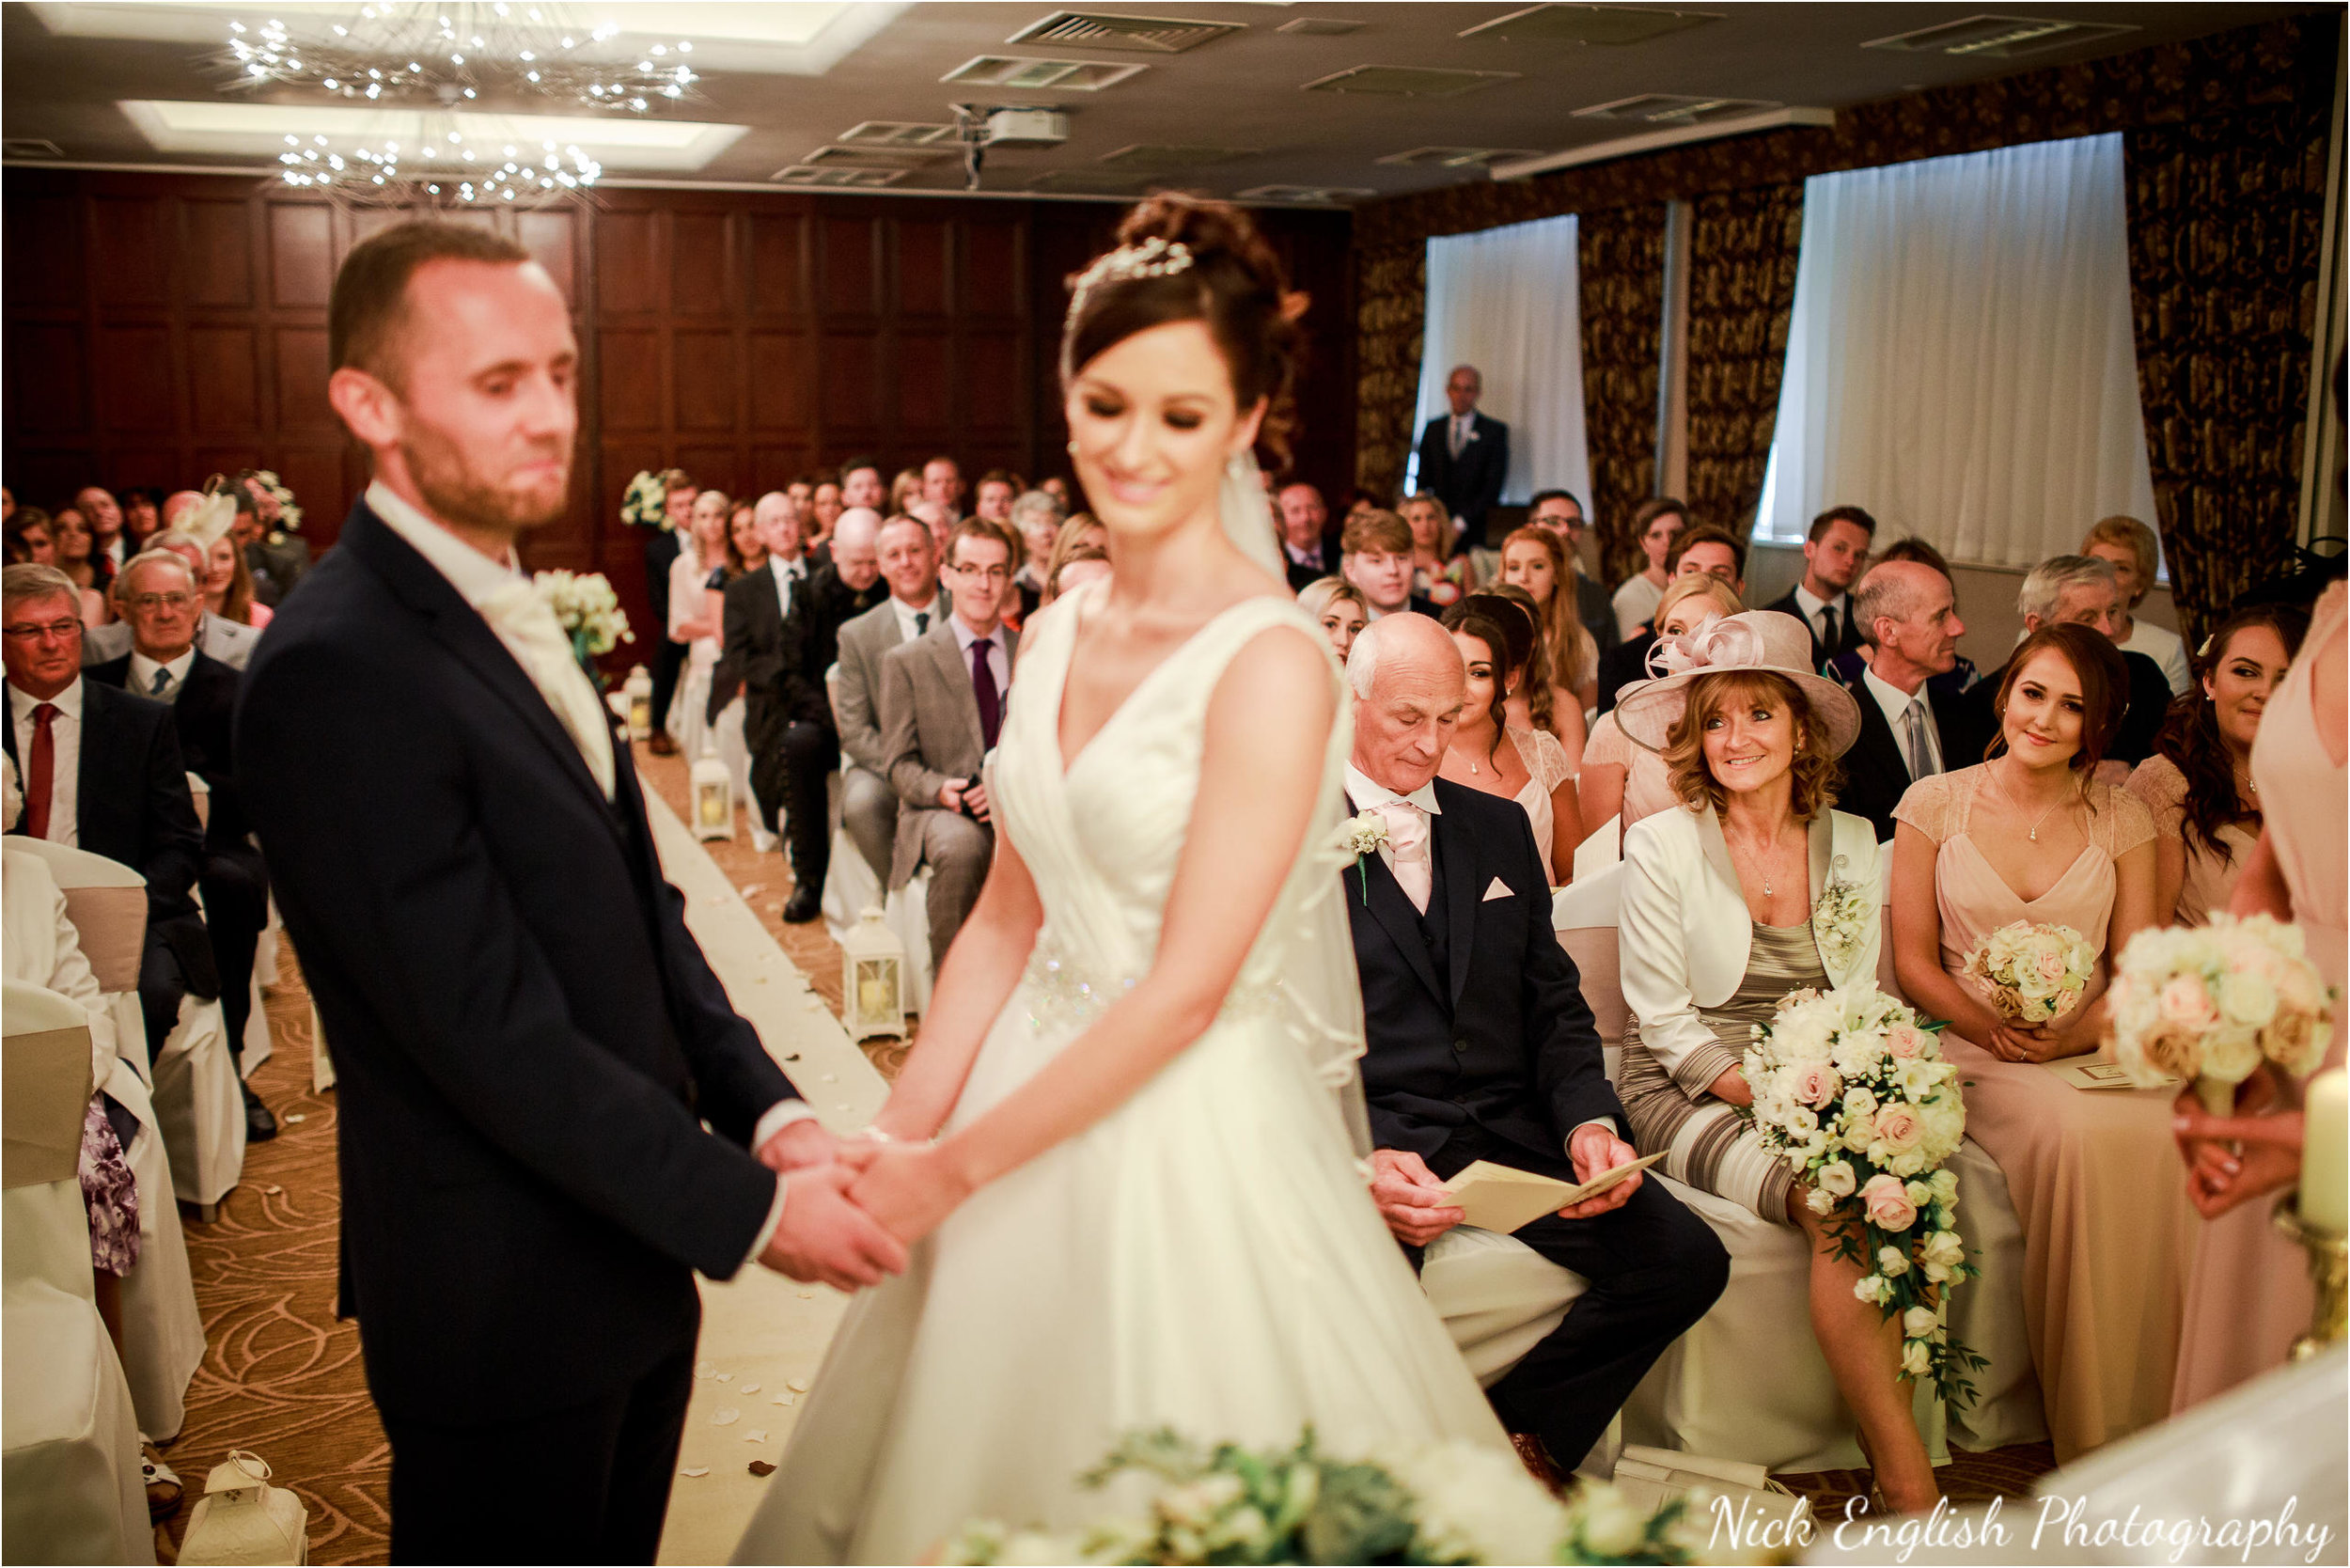 Emily David Wedding Photographs at Barton Grange Preston by Nick English Photography 66jpg.jpeg